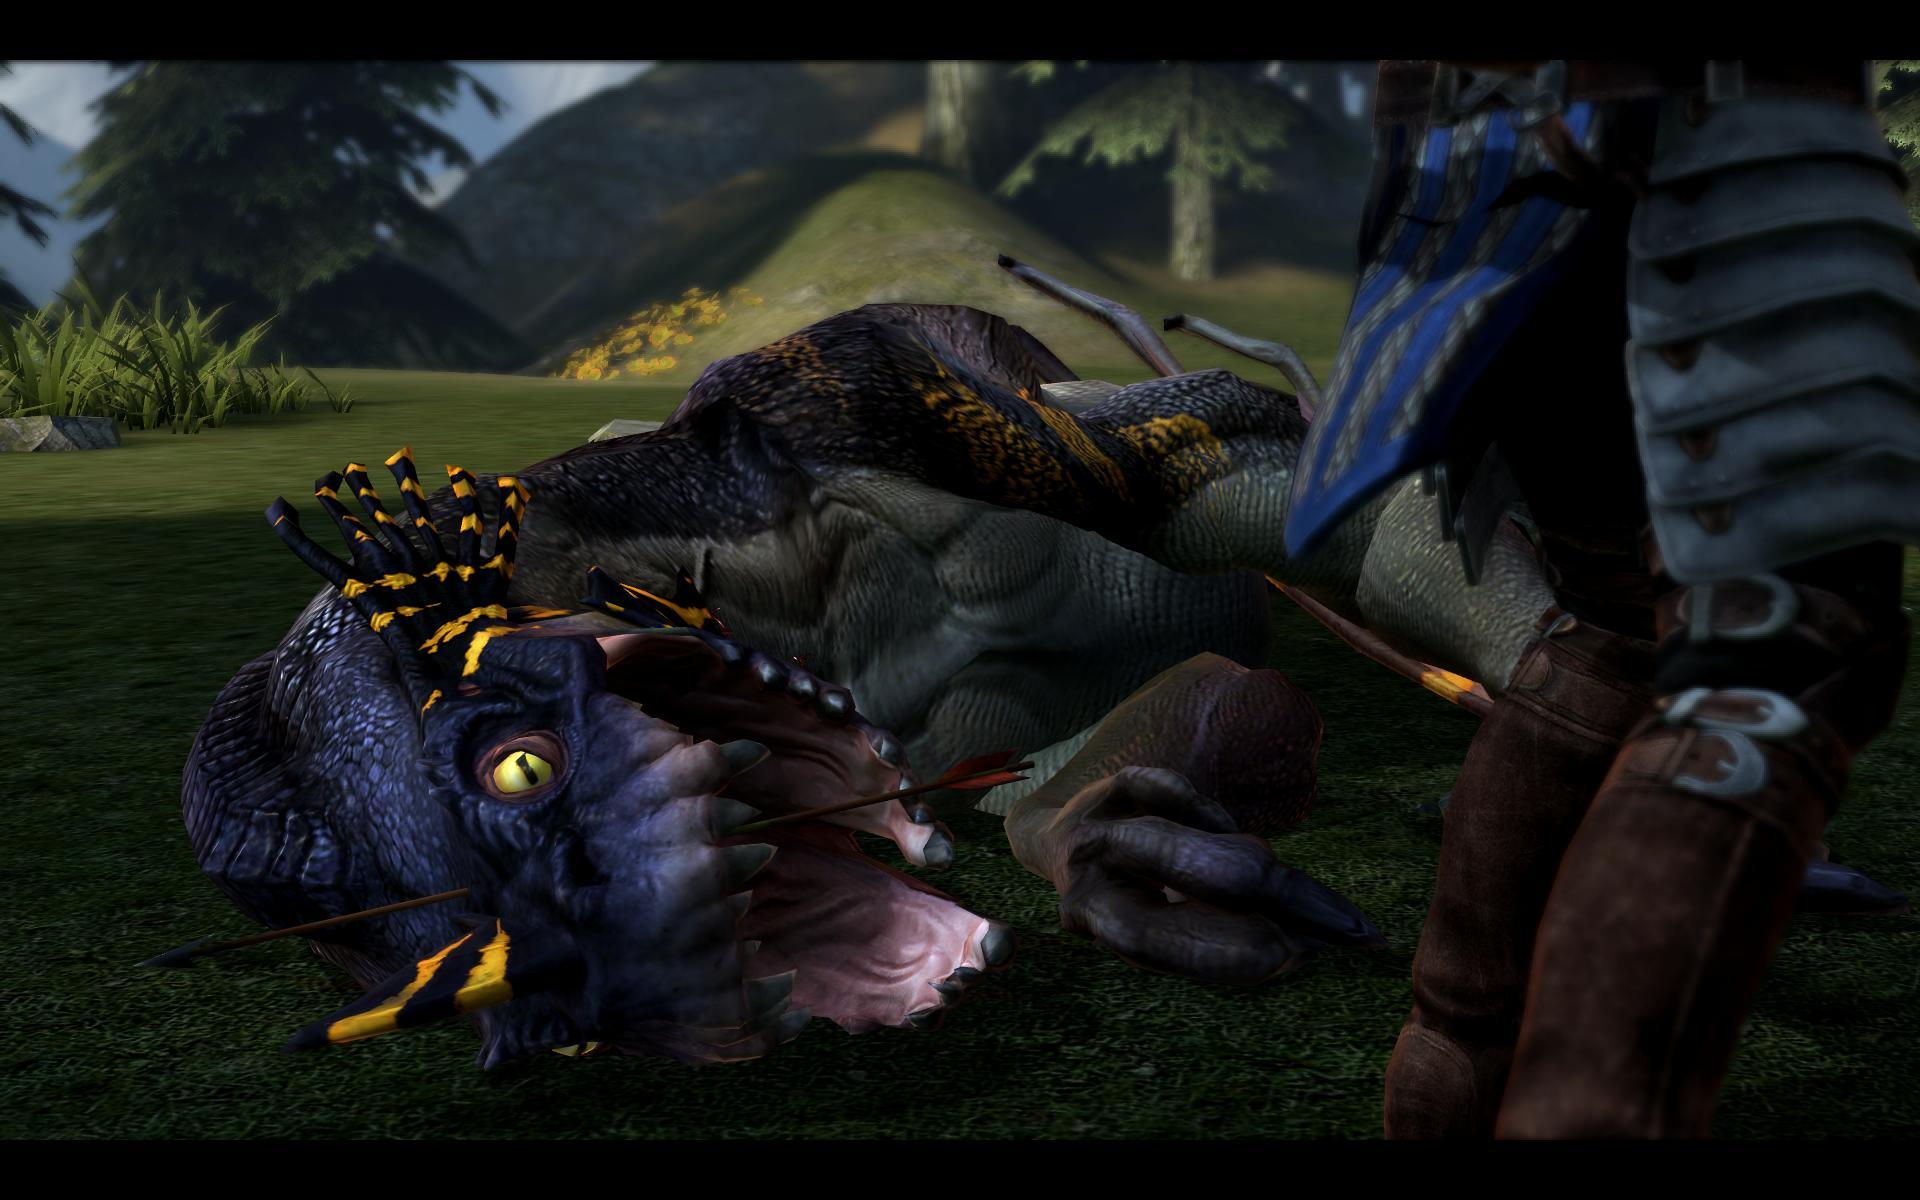 dragonage2-2011-10-22-12-26-38-05